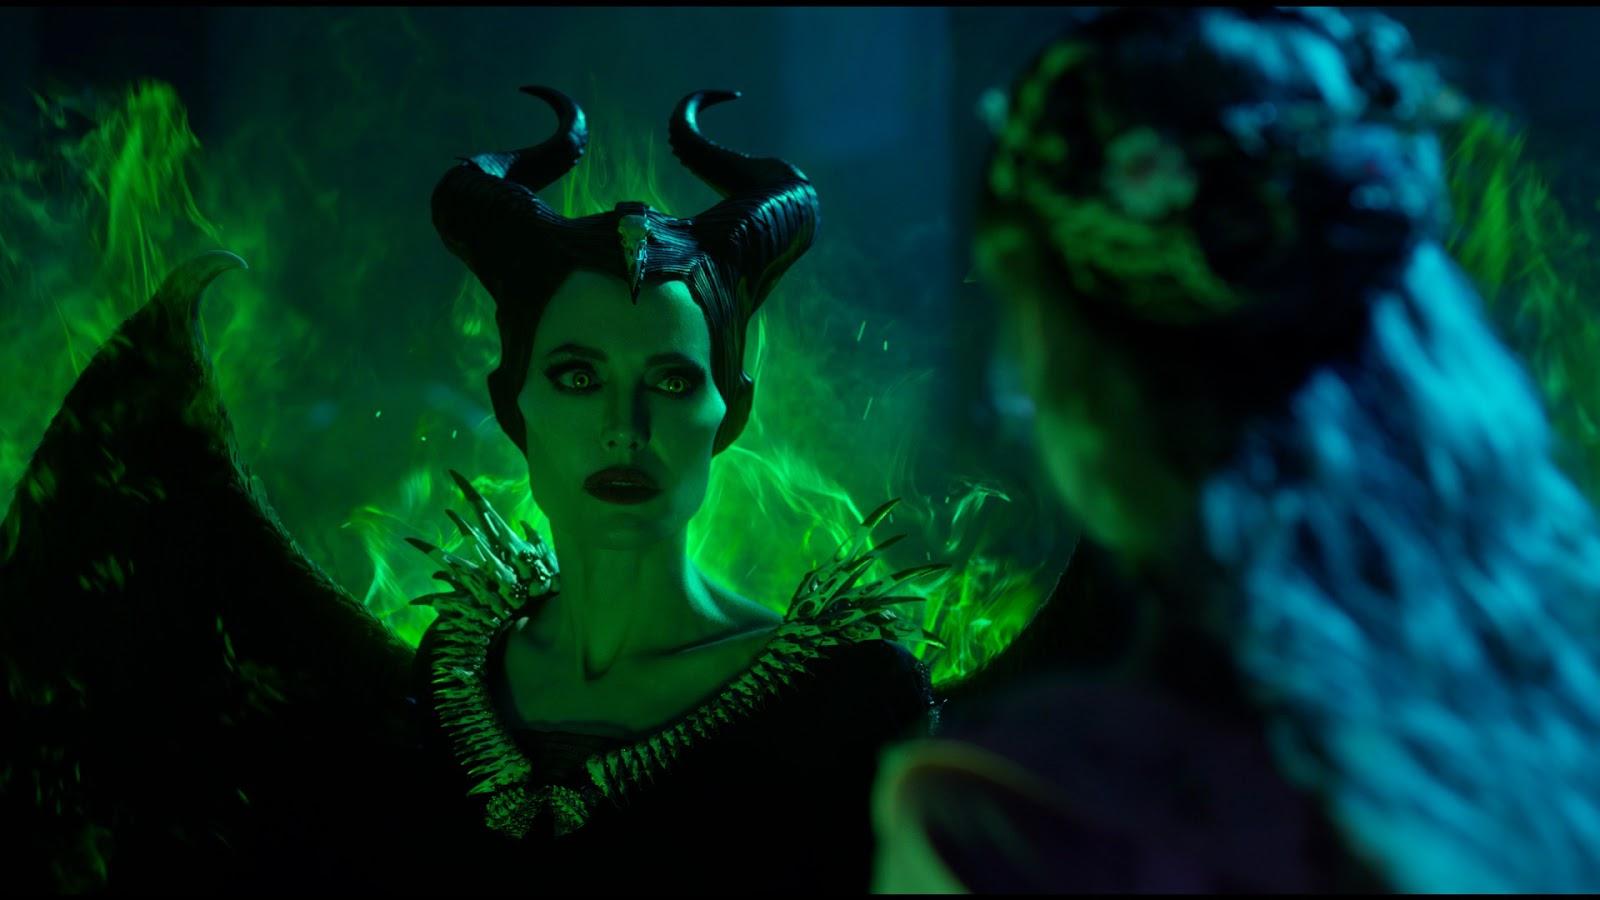 Alamo Drafthouse Cinema Reveals Maleficent Mistress Of